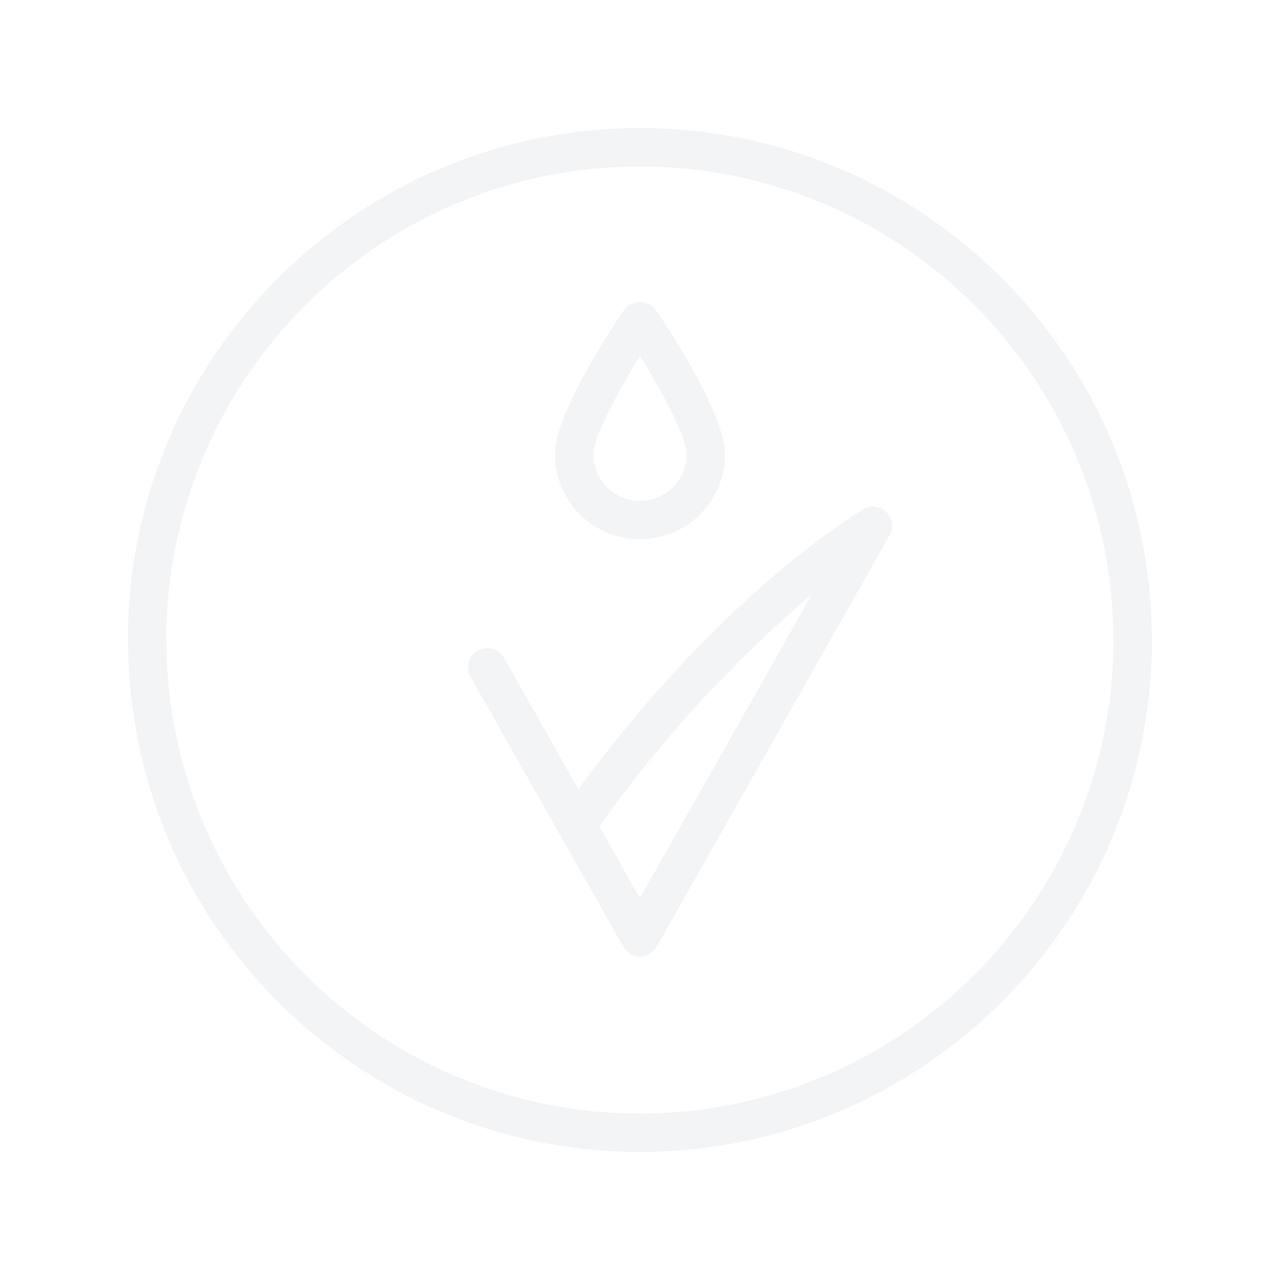 MIZON Joyful Time Essence Acai Berry Mask 23g тканевая маска для лица